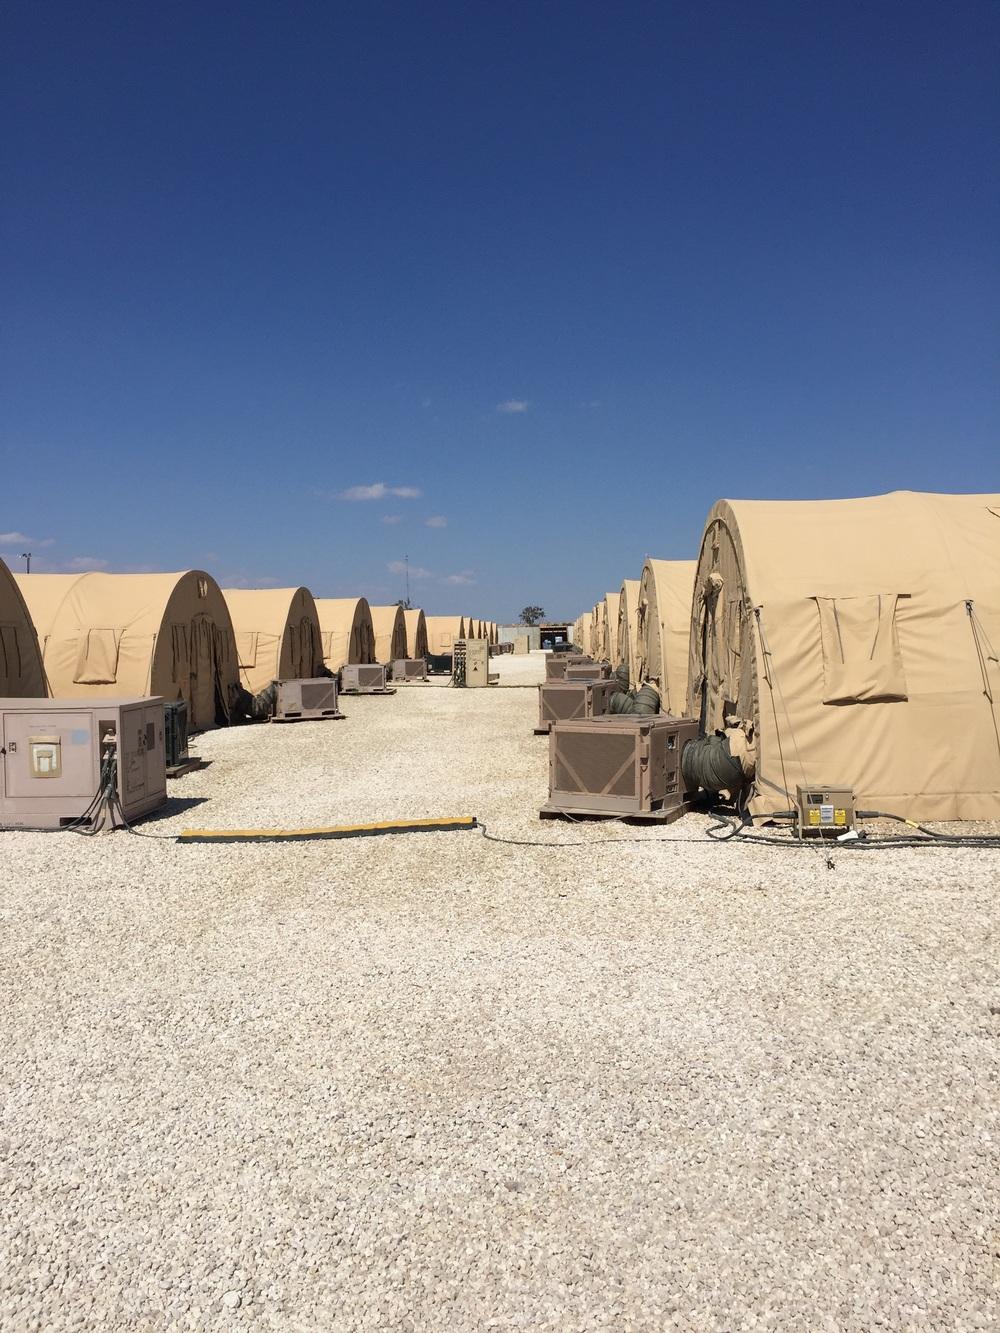 Tent City. Cozy, right?